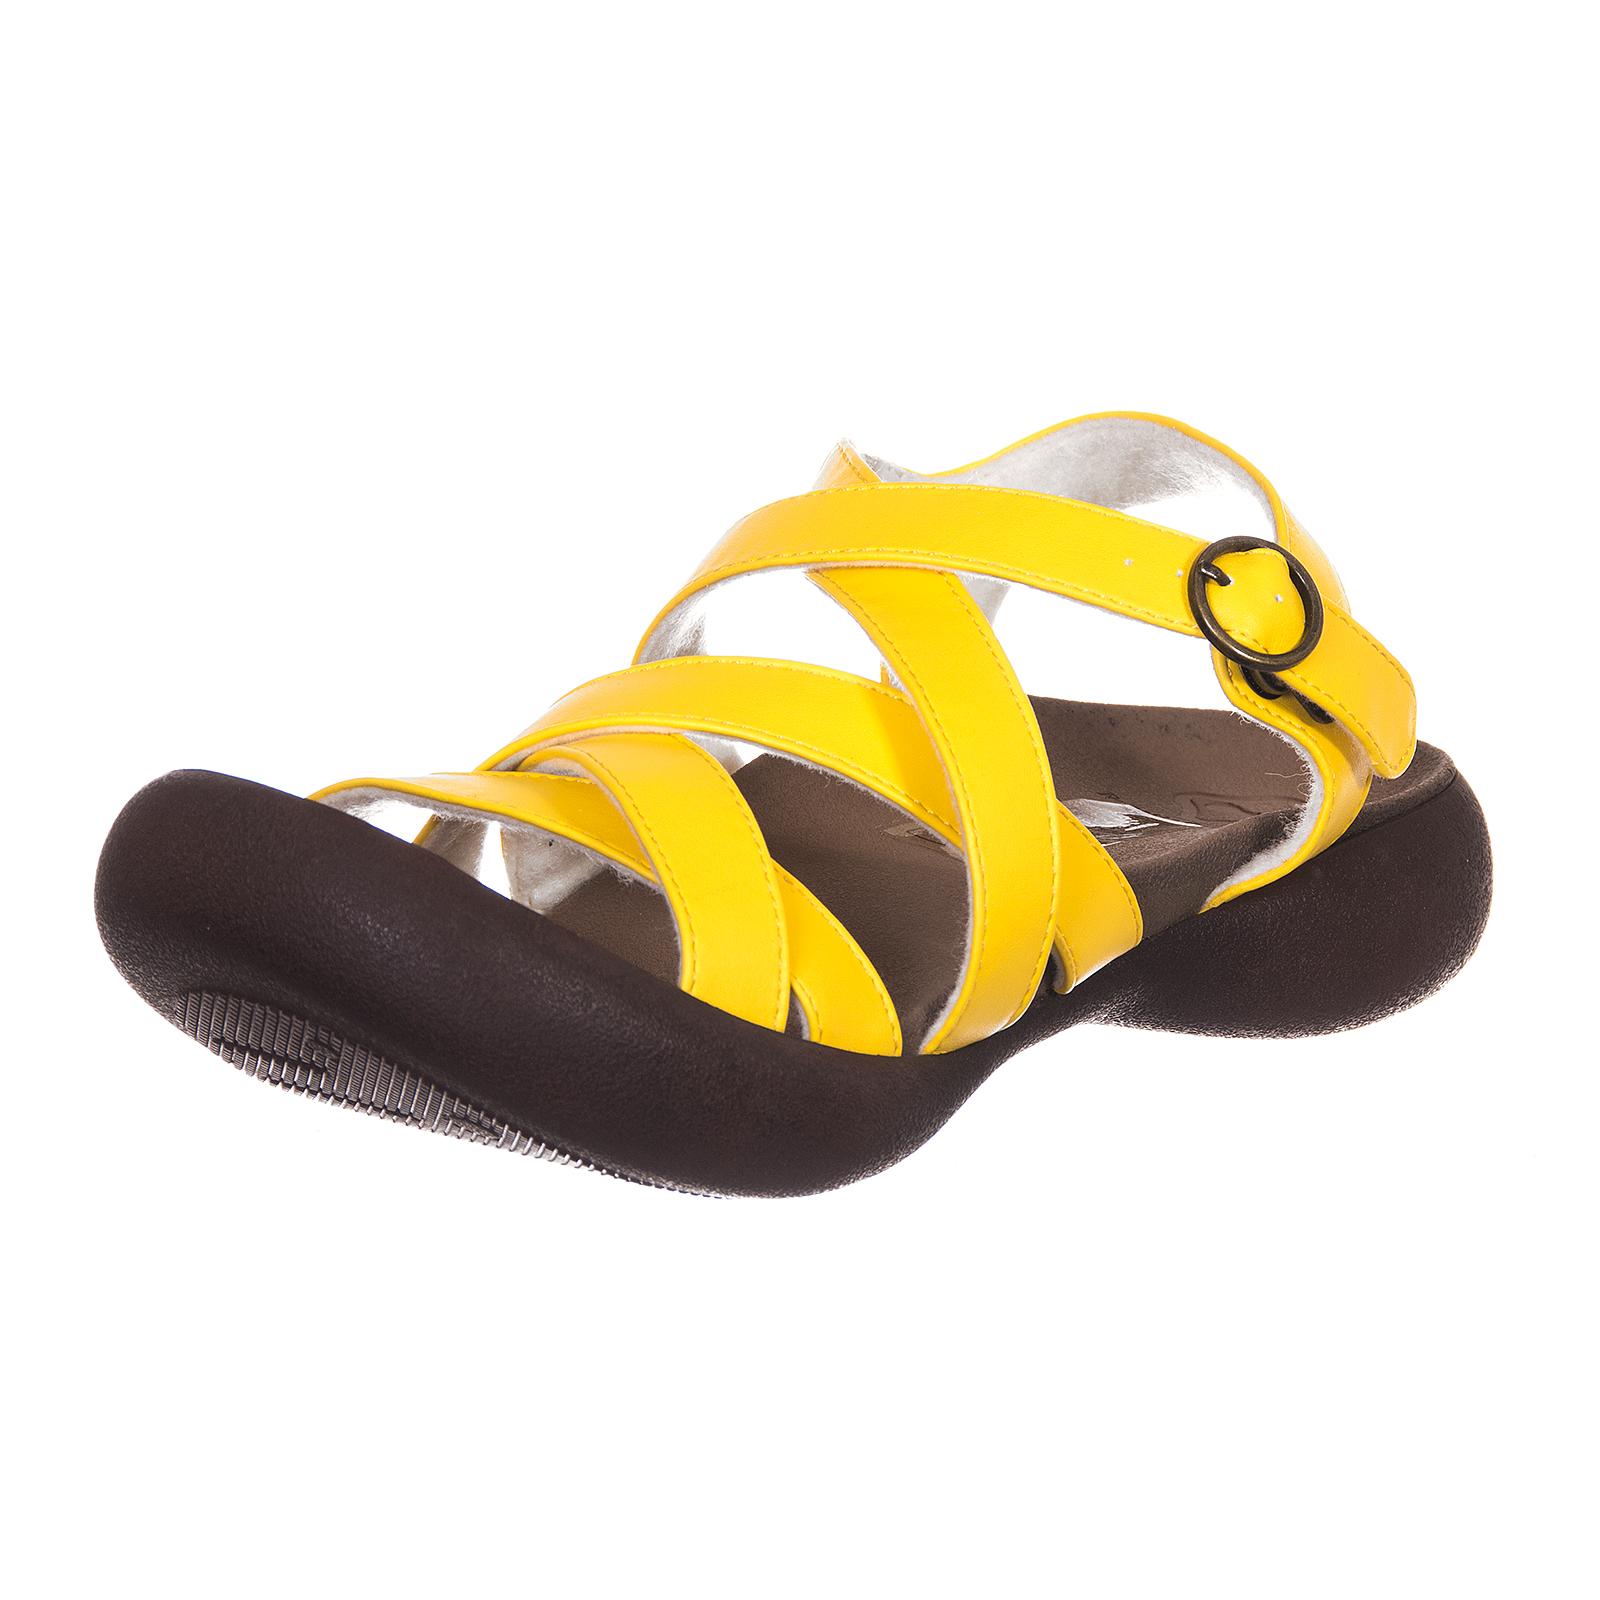 Riemen Kanus-w Feld Arum Yellow Gelb Gelb